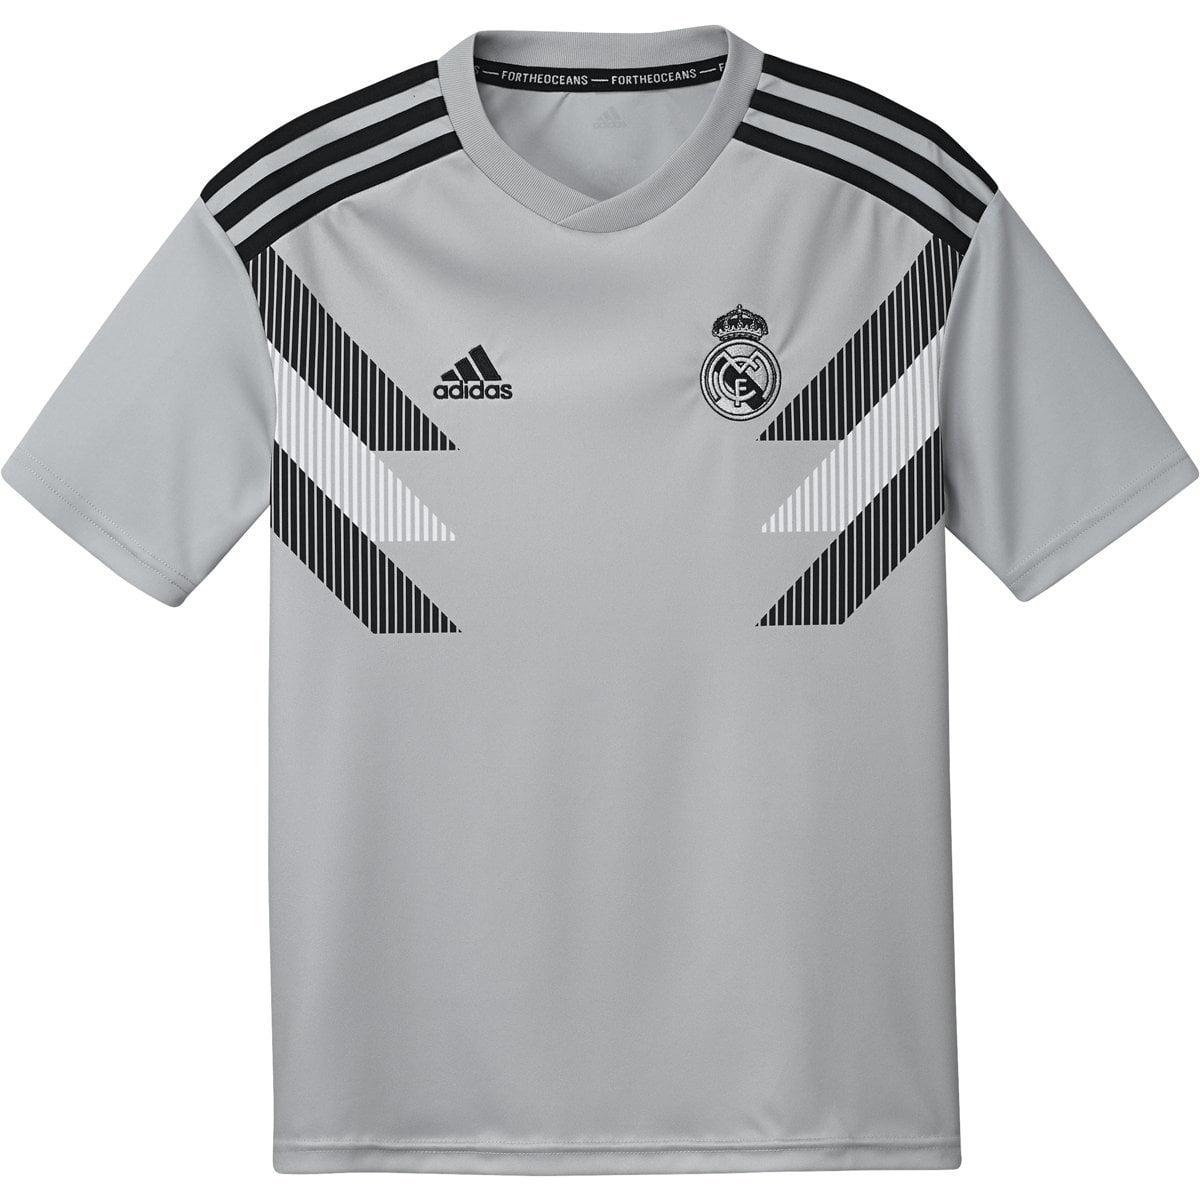 6a91cdb30a5 adidas Youth Real Madrid Home Preshirt 2018/2019 | CW5827 - Walmart.com